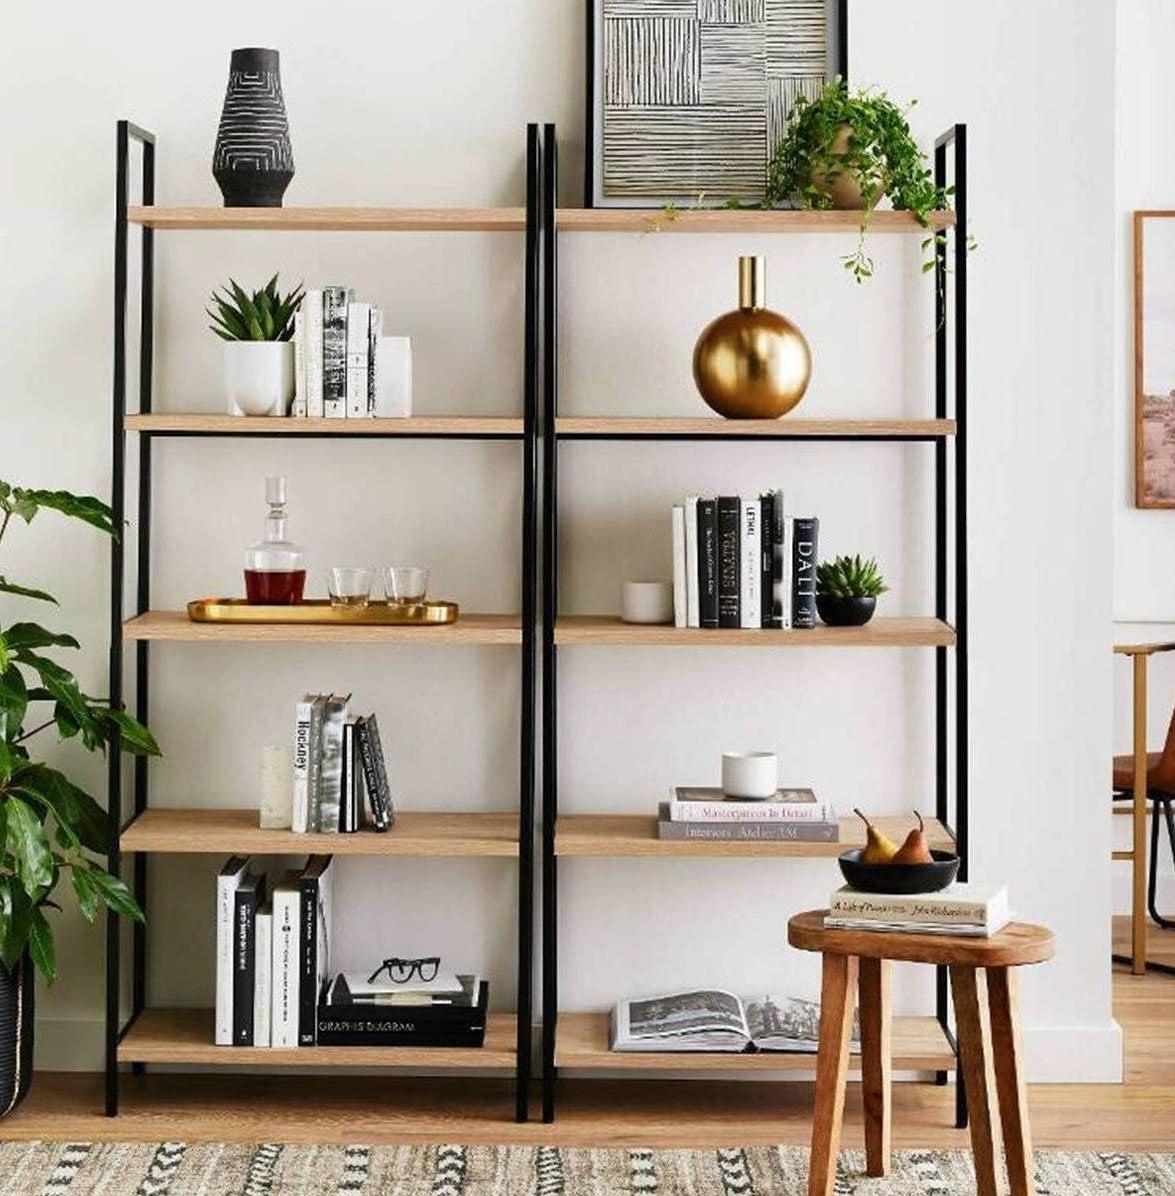 A ladder bookshelf with a black metal frame